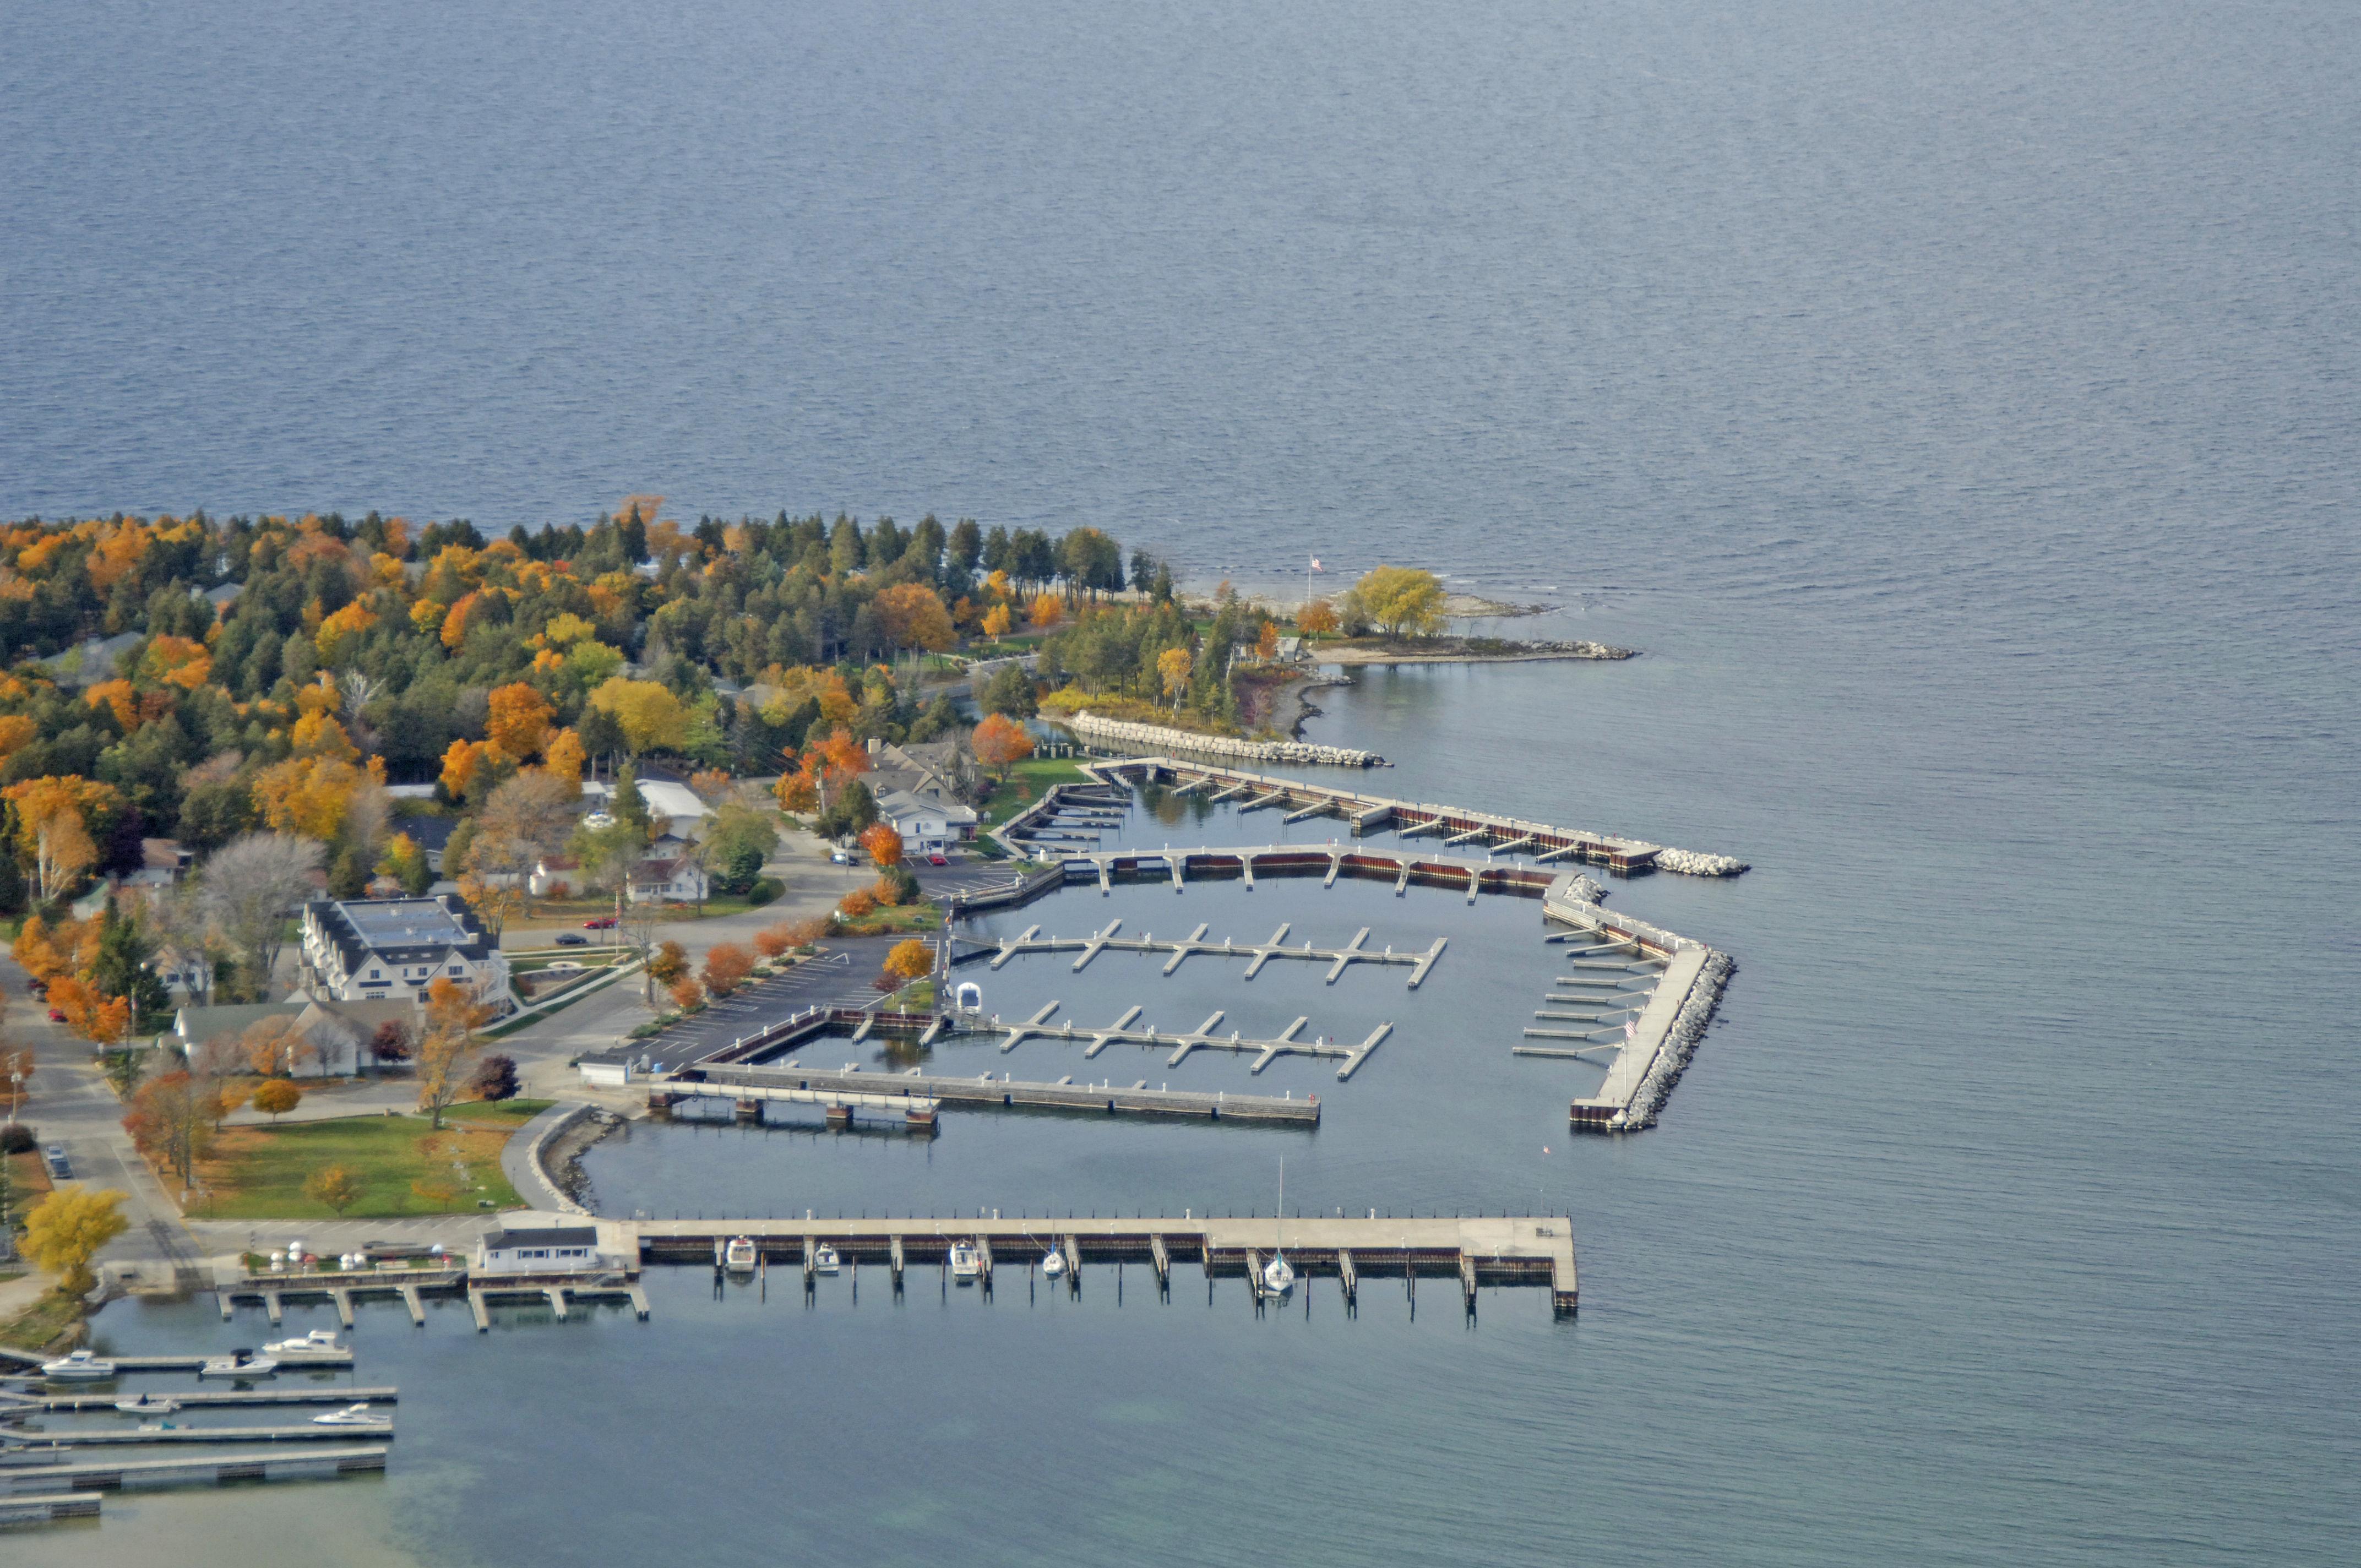 Alibi dock marina in fish creek wi united states for Fish creek wisconsin